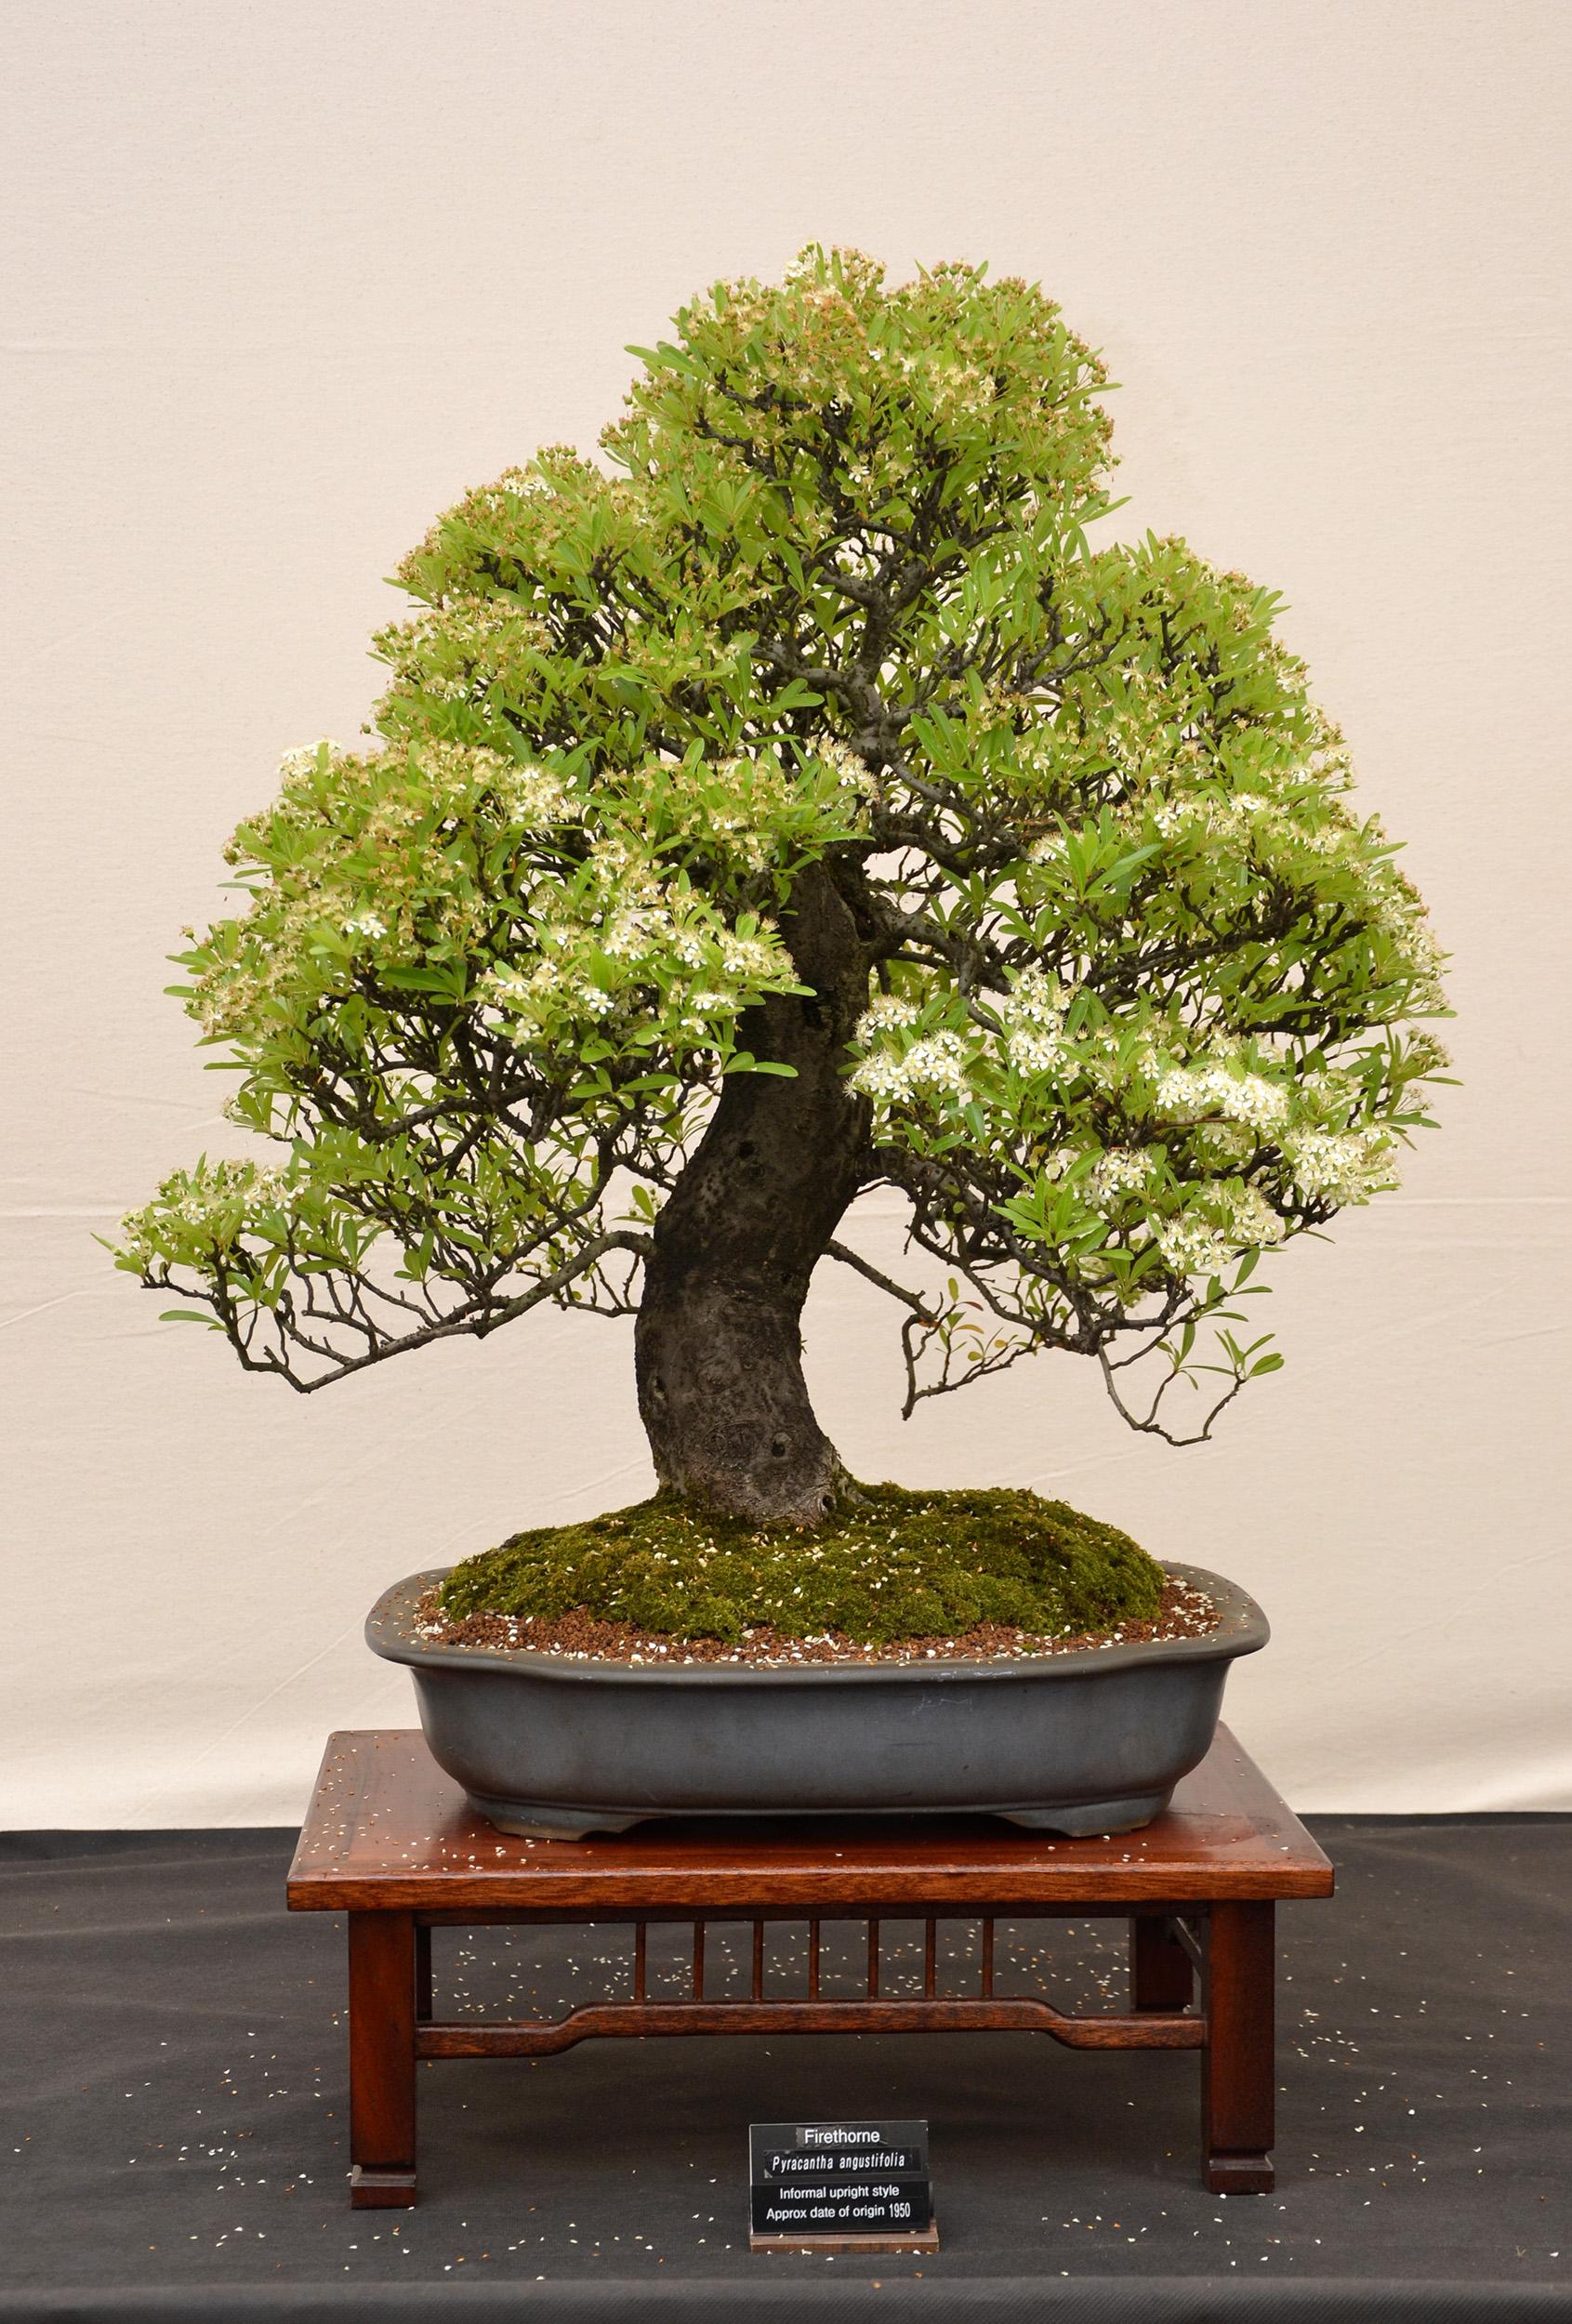 Free Photo Firethorn Bonsai Aesthetics Miniature Moss Free Download Jooinn